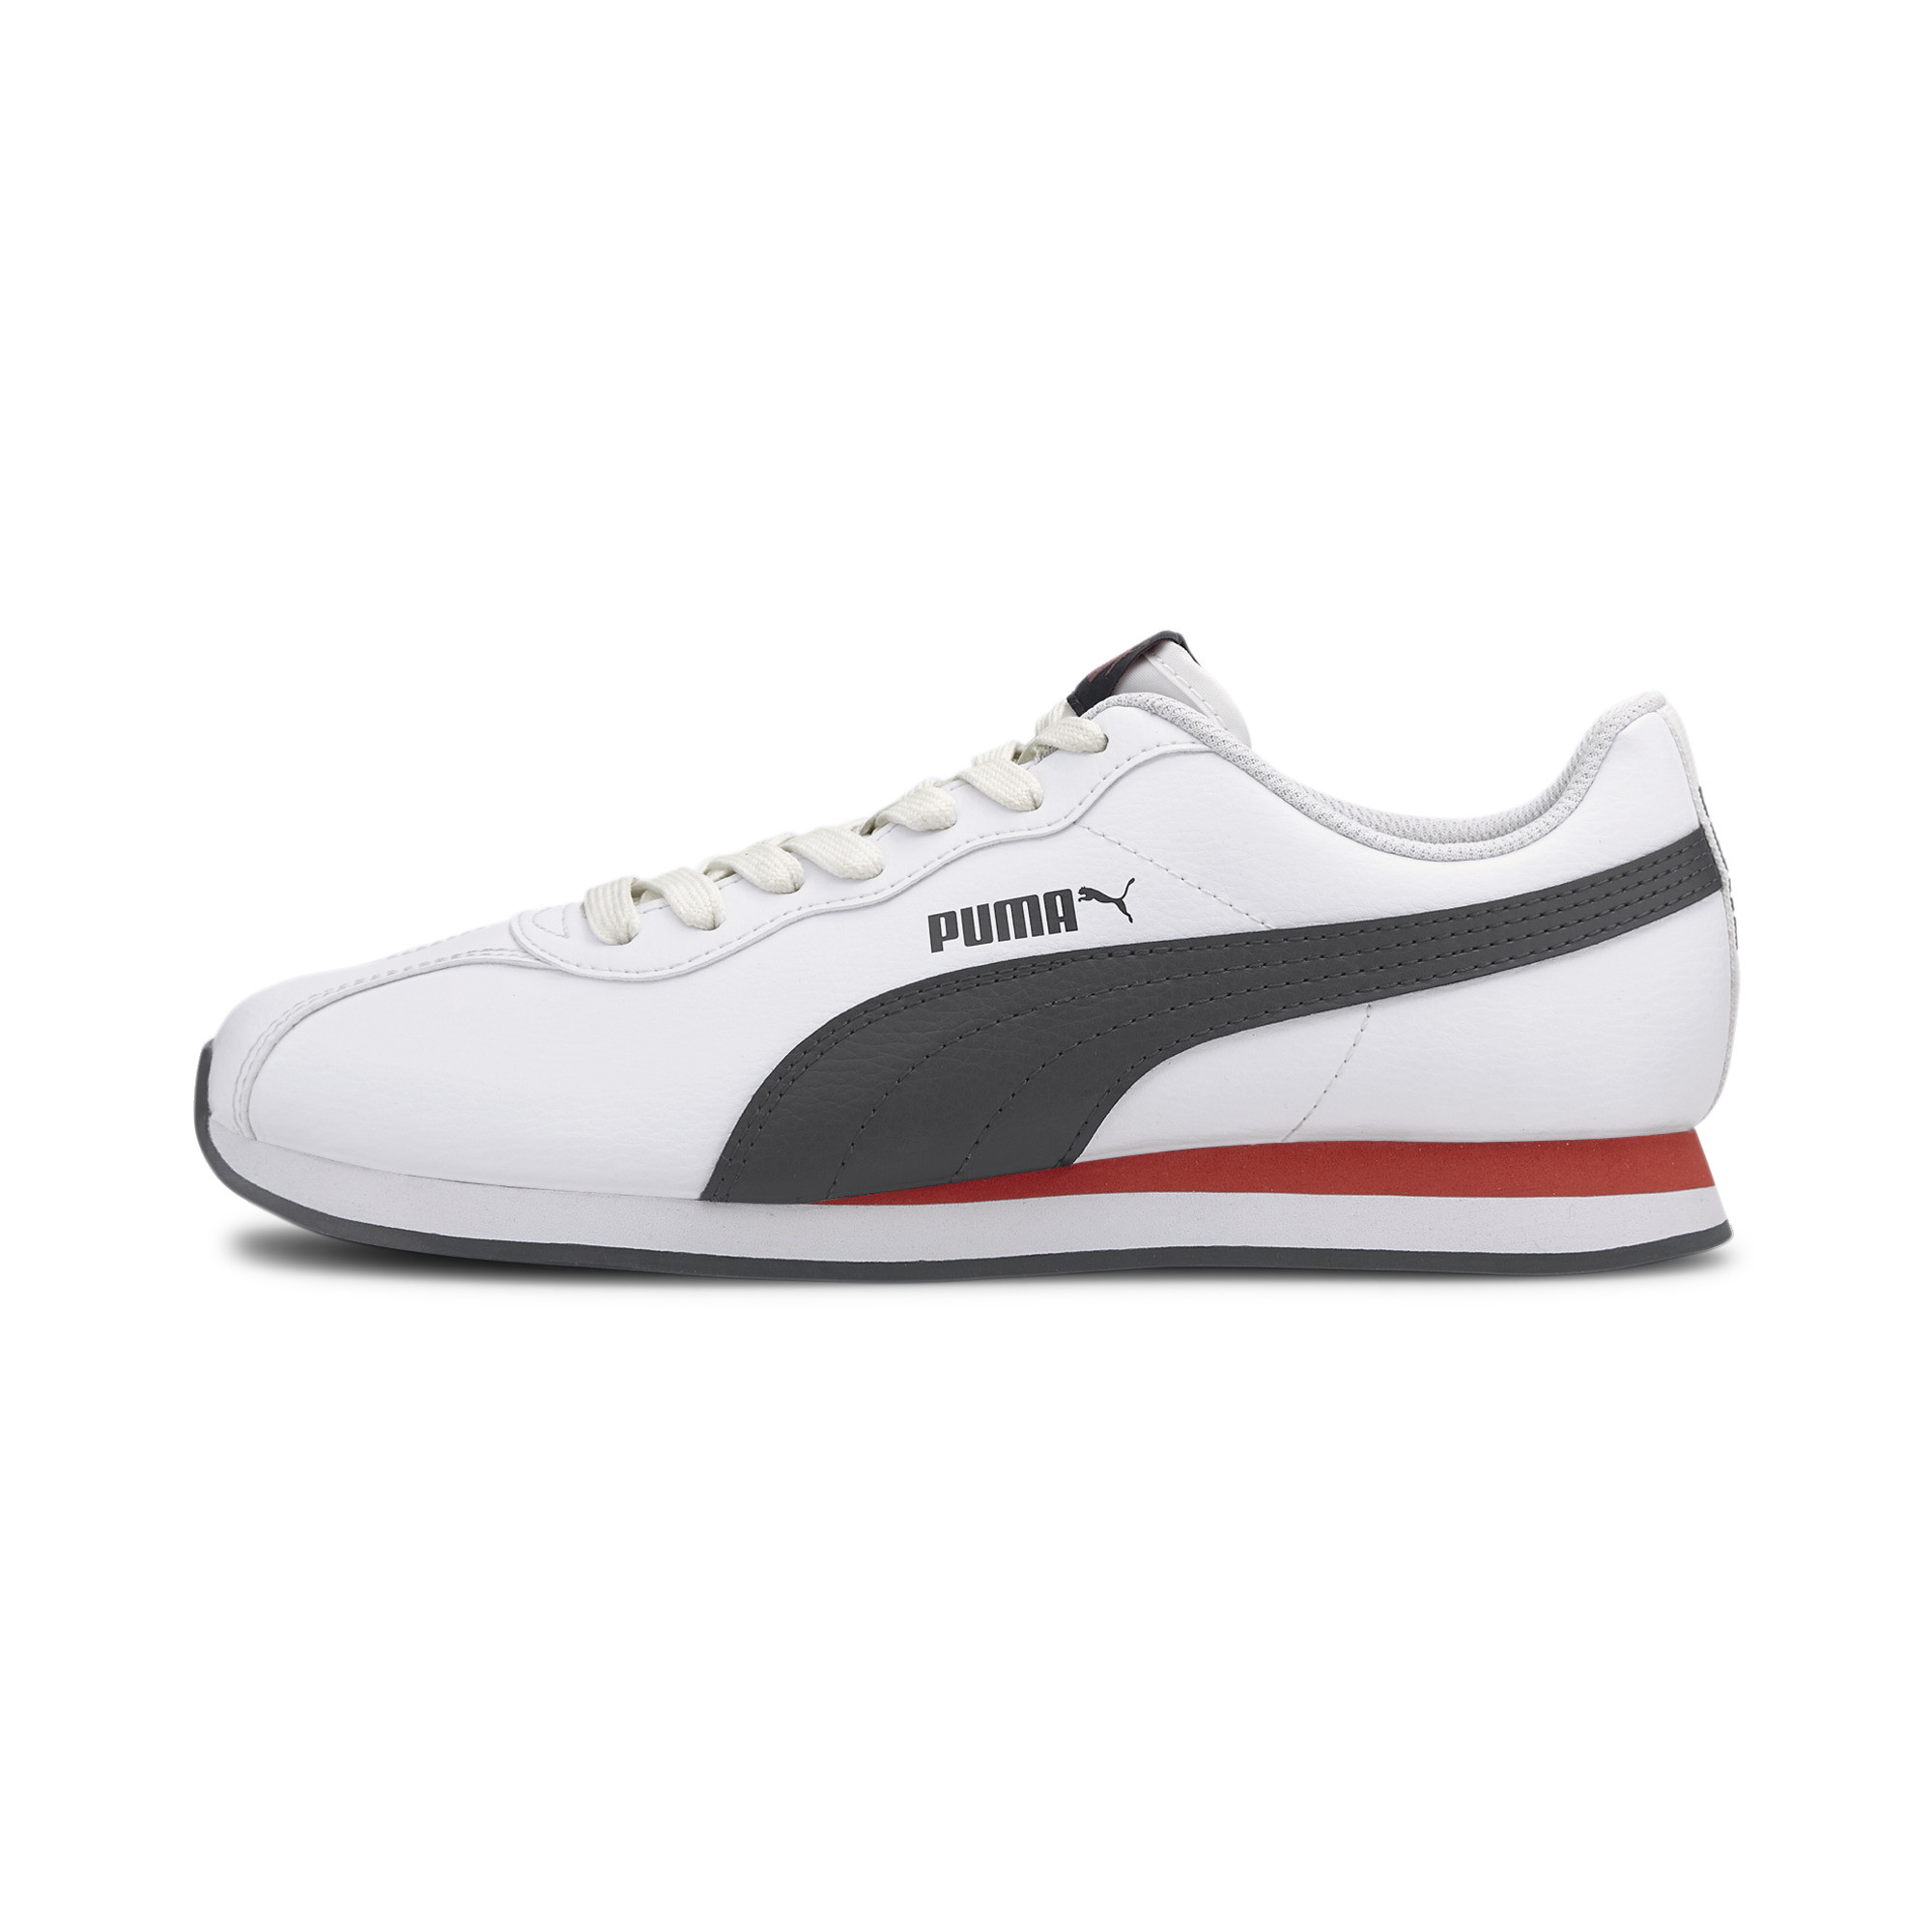 thumbnail 38 - PUMA Men's Turin II Sneakers